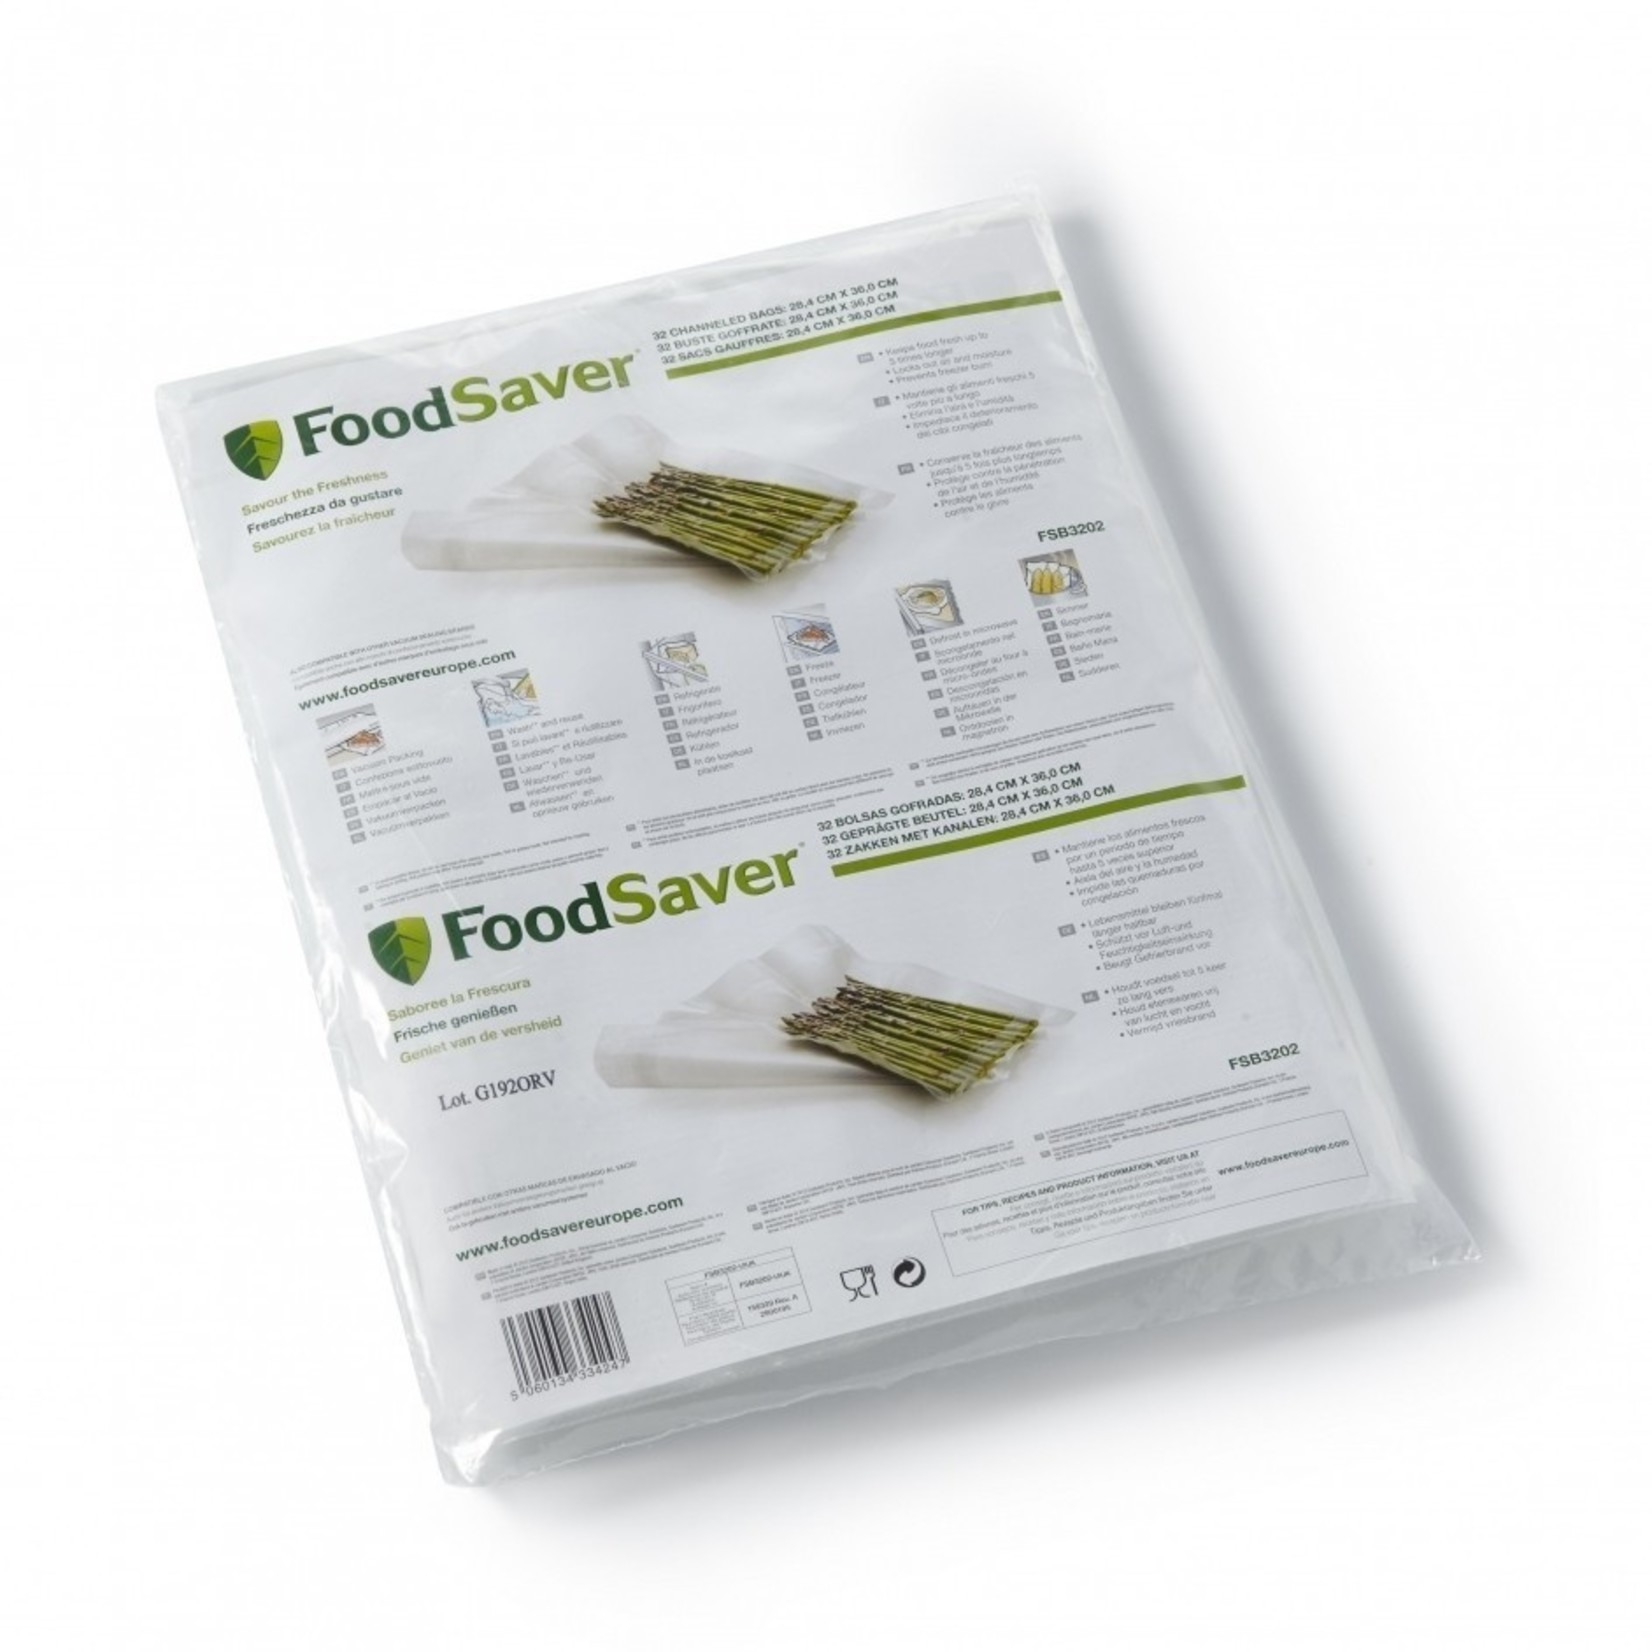 Foodsaver FoodSaver vershoudzak 28x36cm 32 stuks